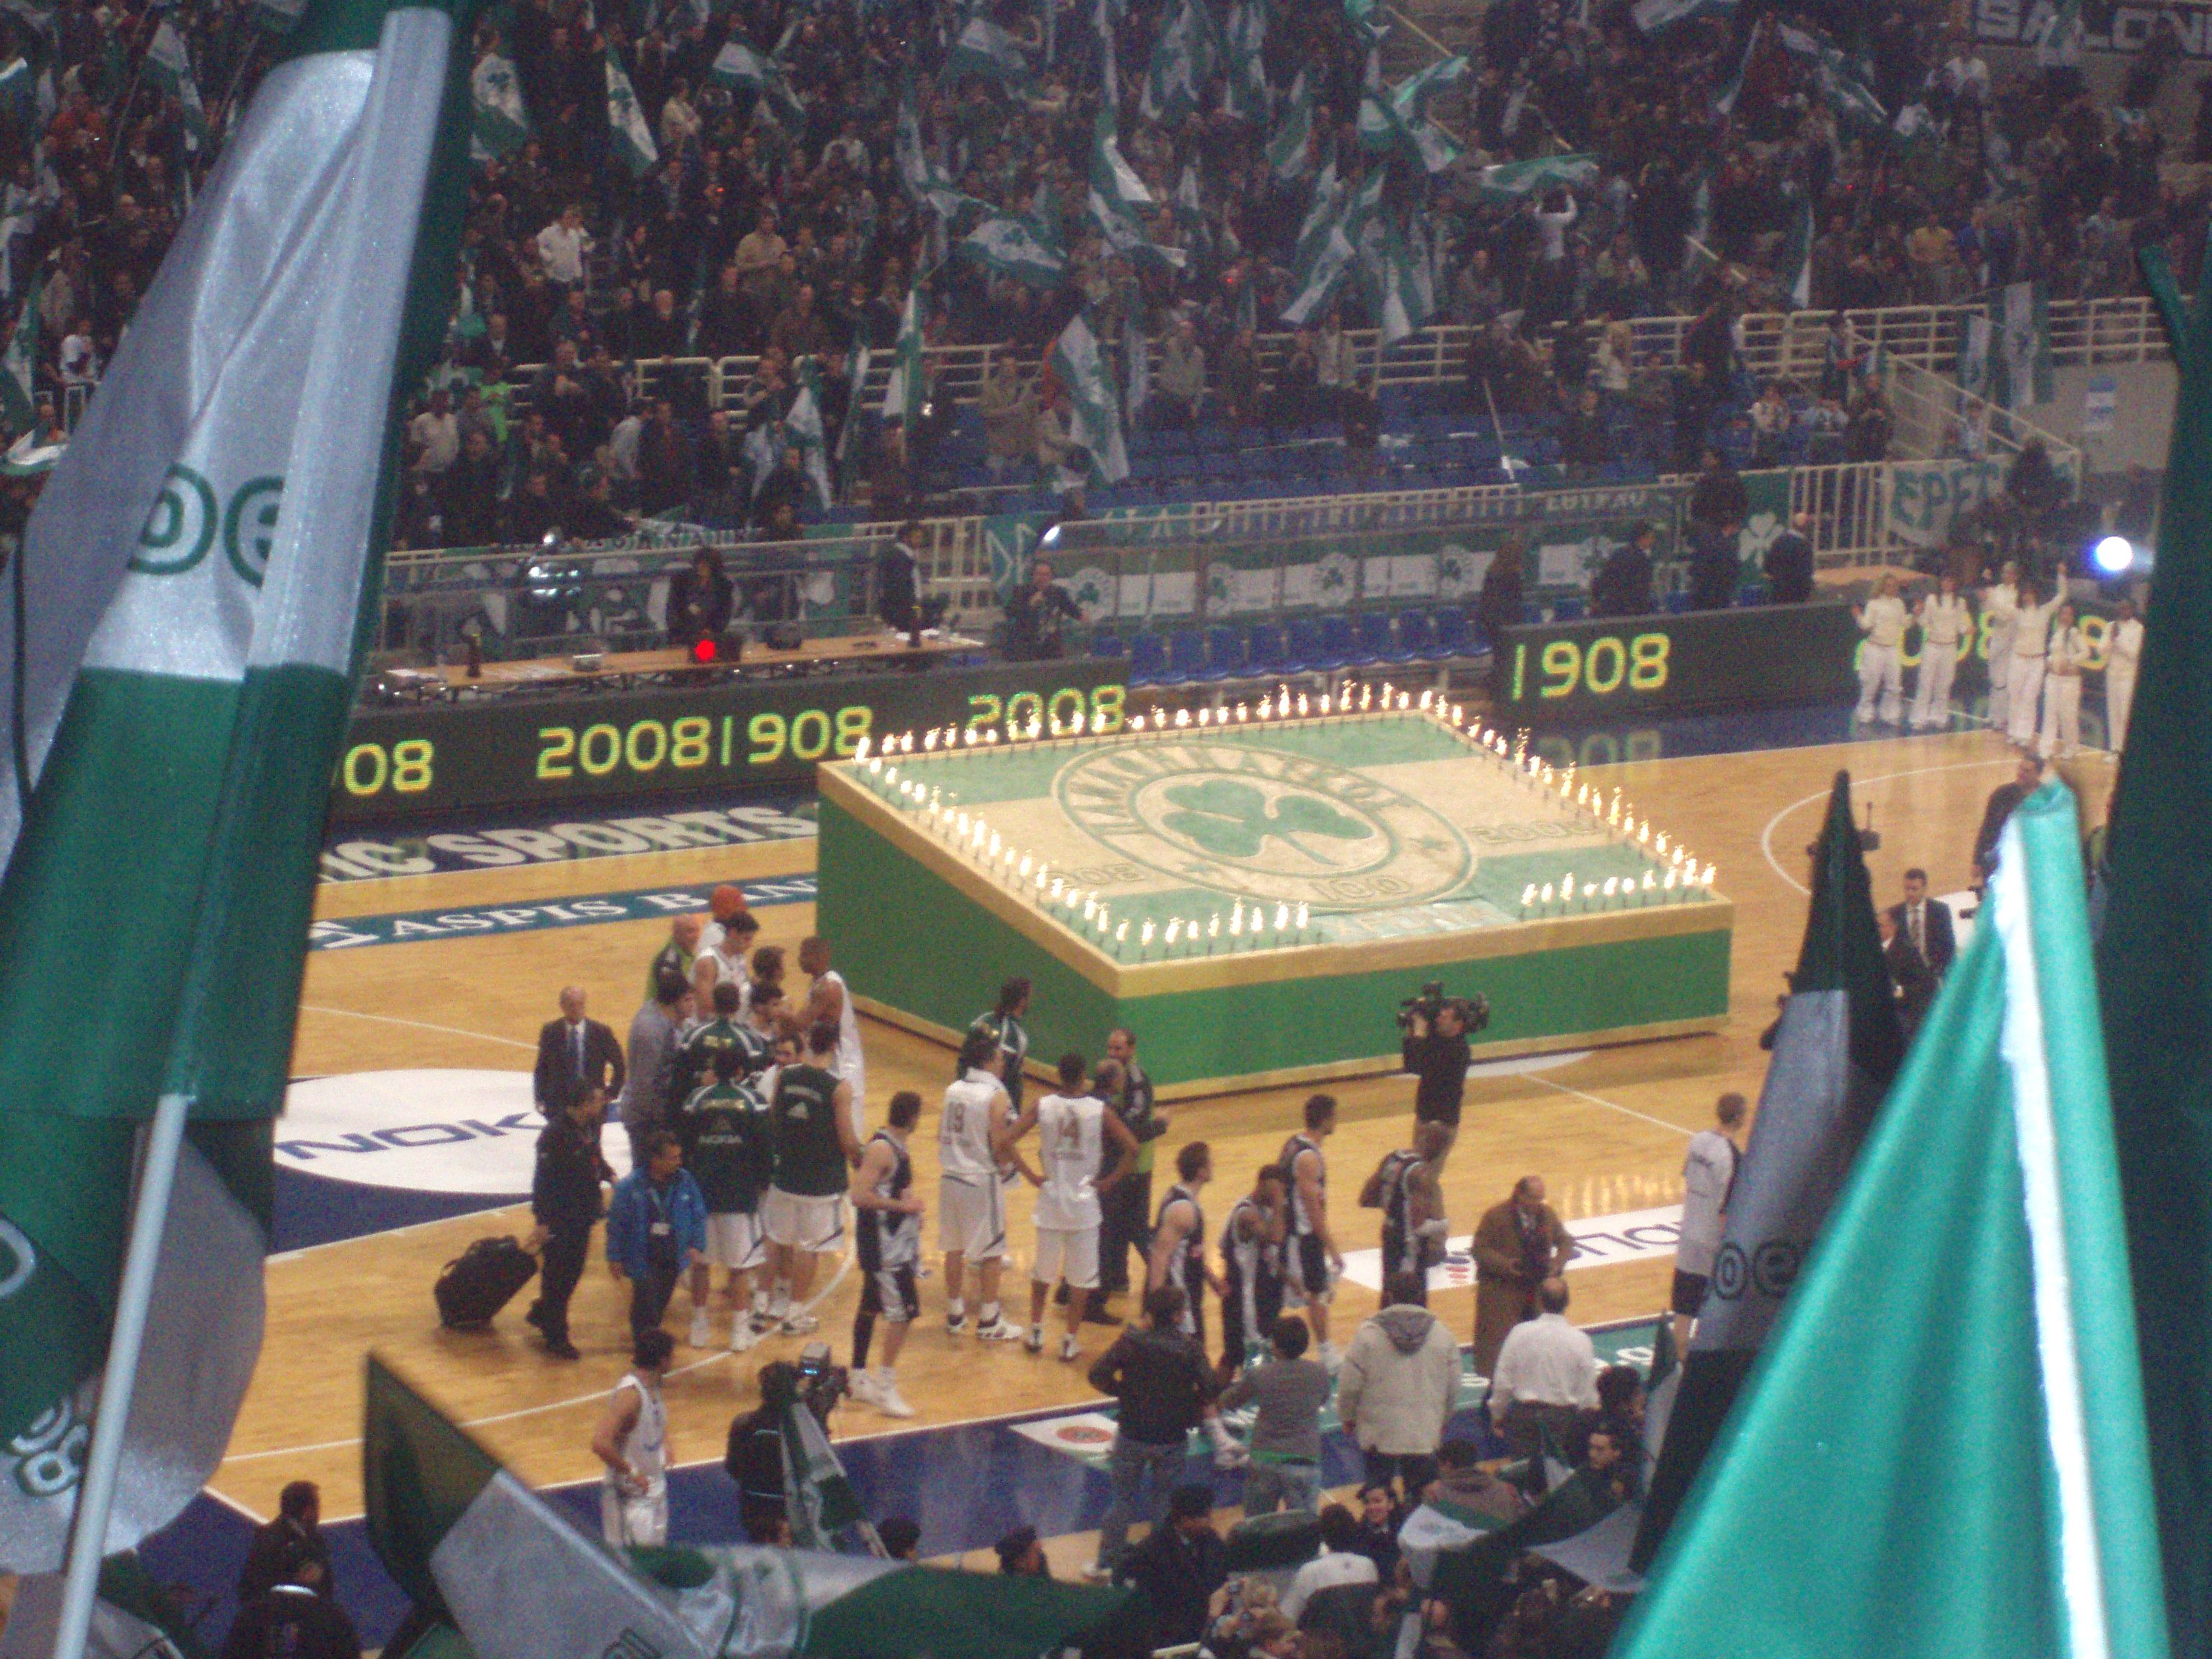 The 100 years celebration 1908 2008